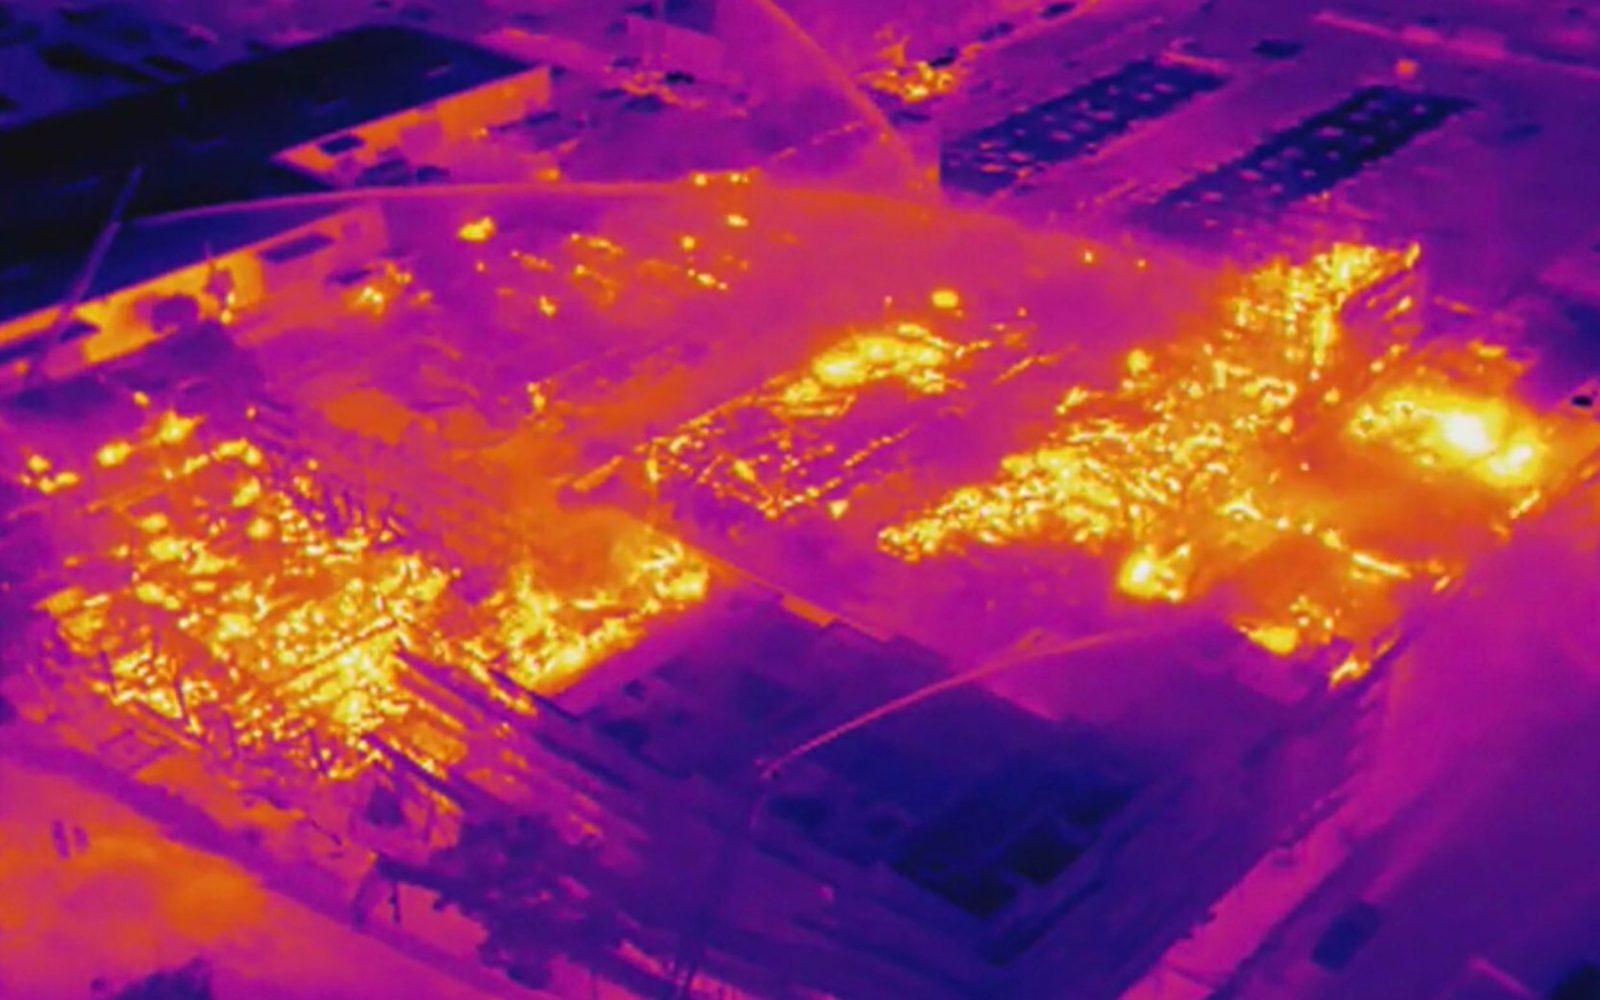 25° Thermal Camera Cores for Drones - DIY Drones |Drone Thermal Camera